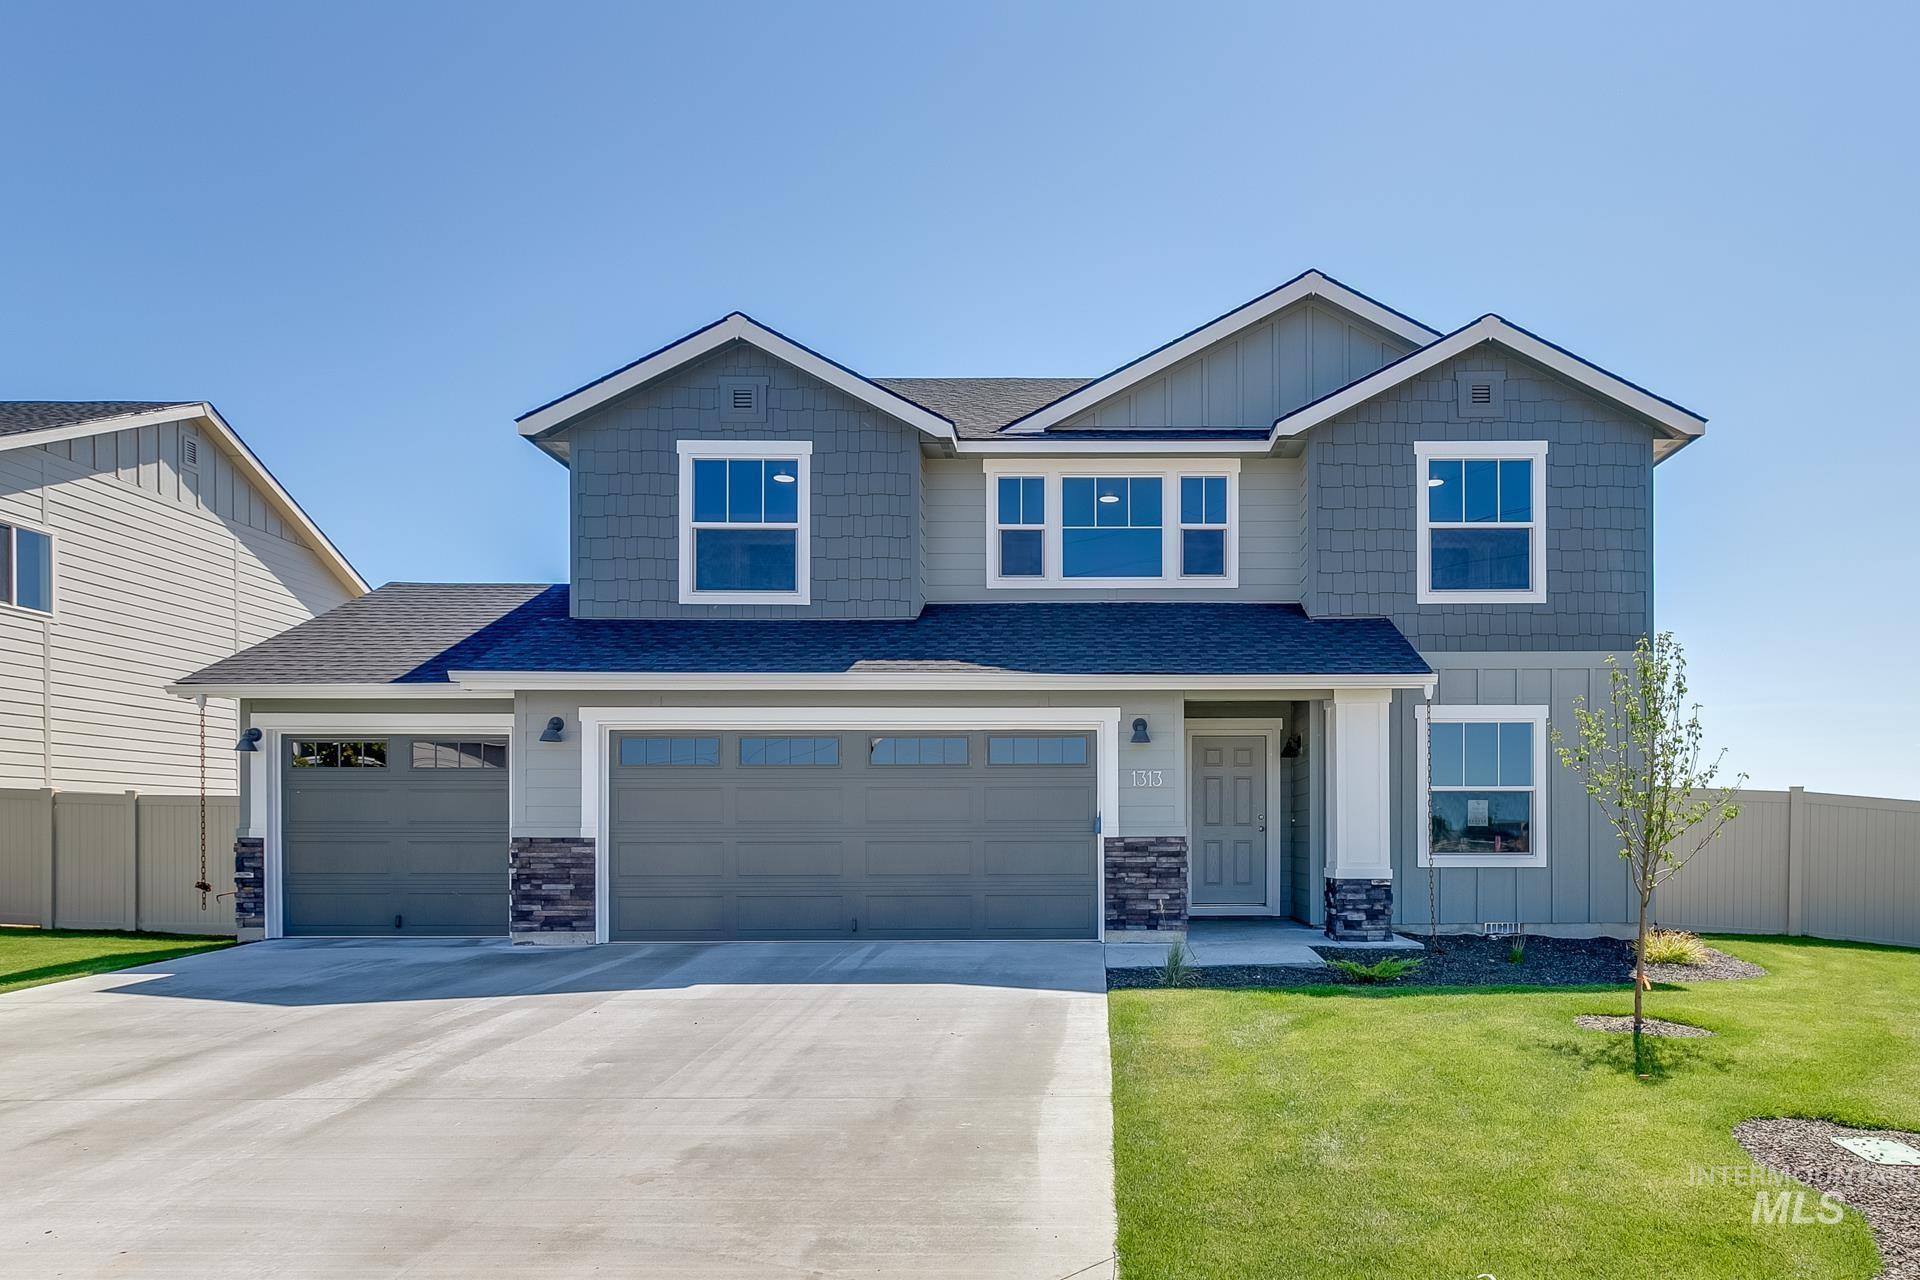 3943 W Cobalt St Property Photo